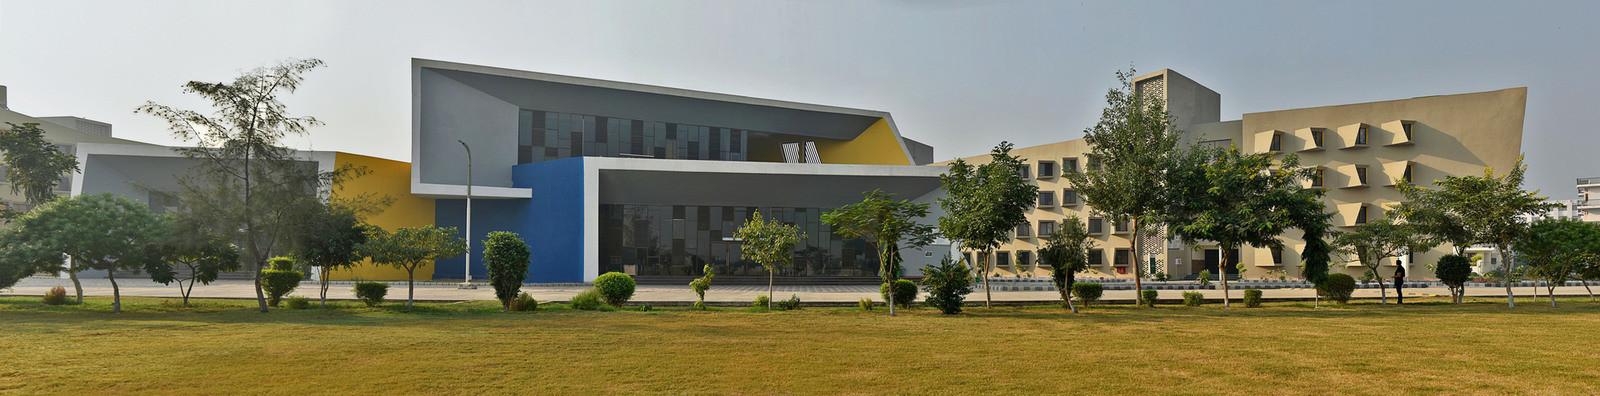 Студенческий хостел на 800 комнат в Индии